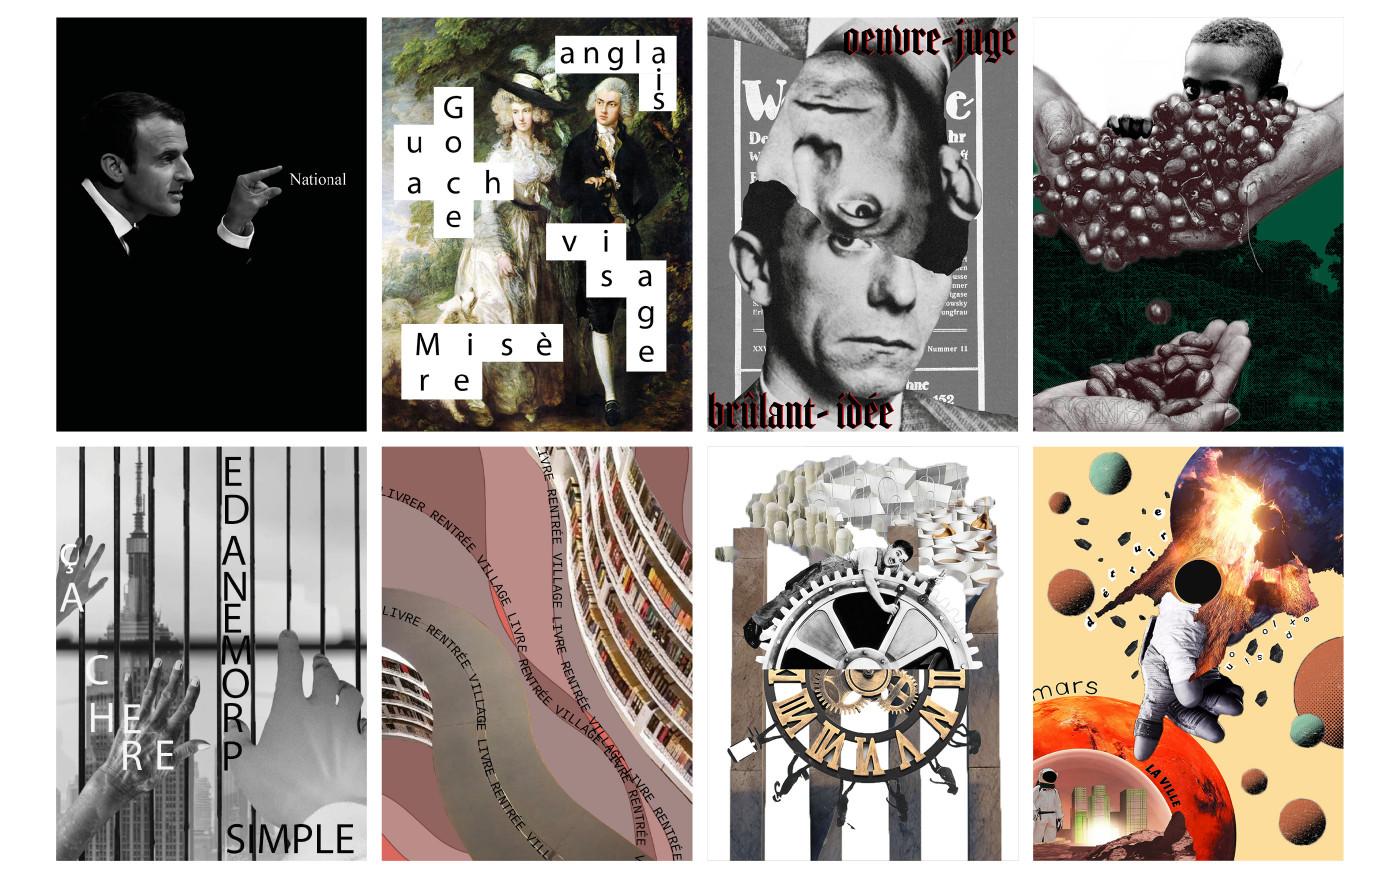 Manipuler / Lecture des images